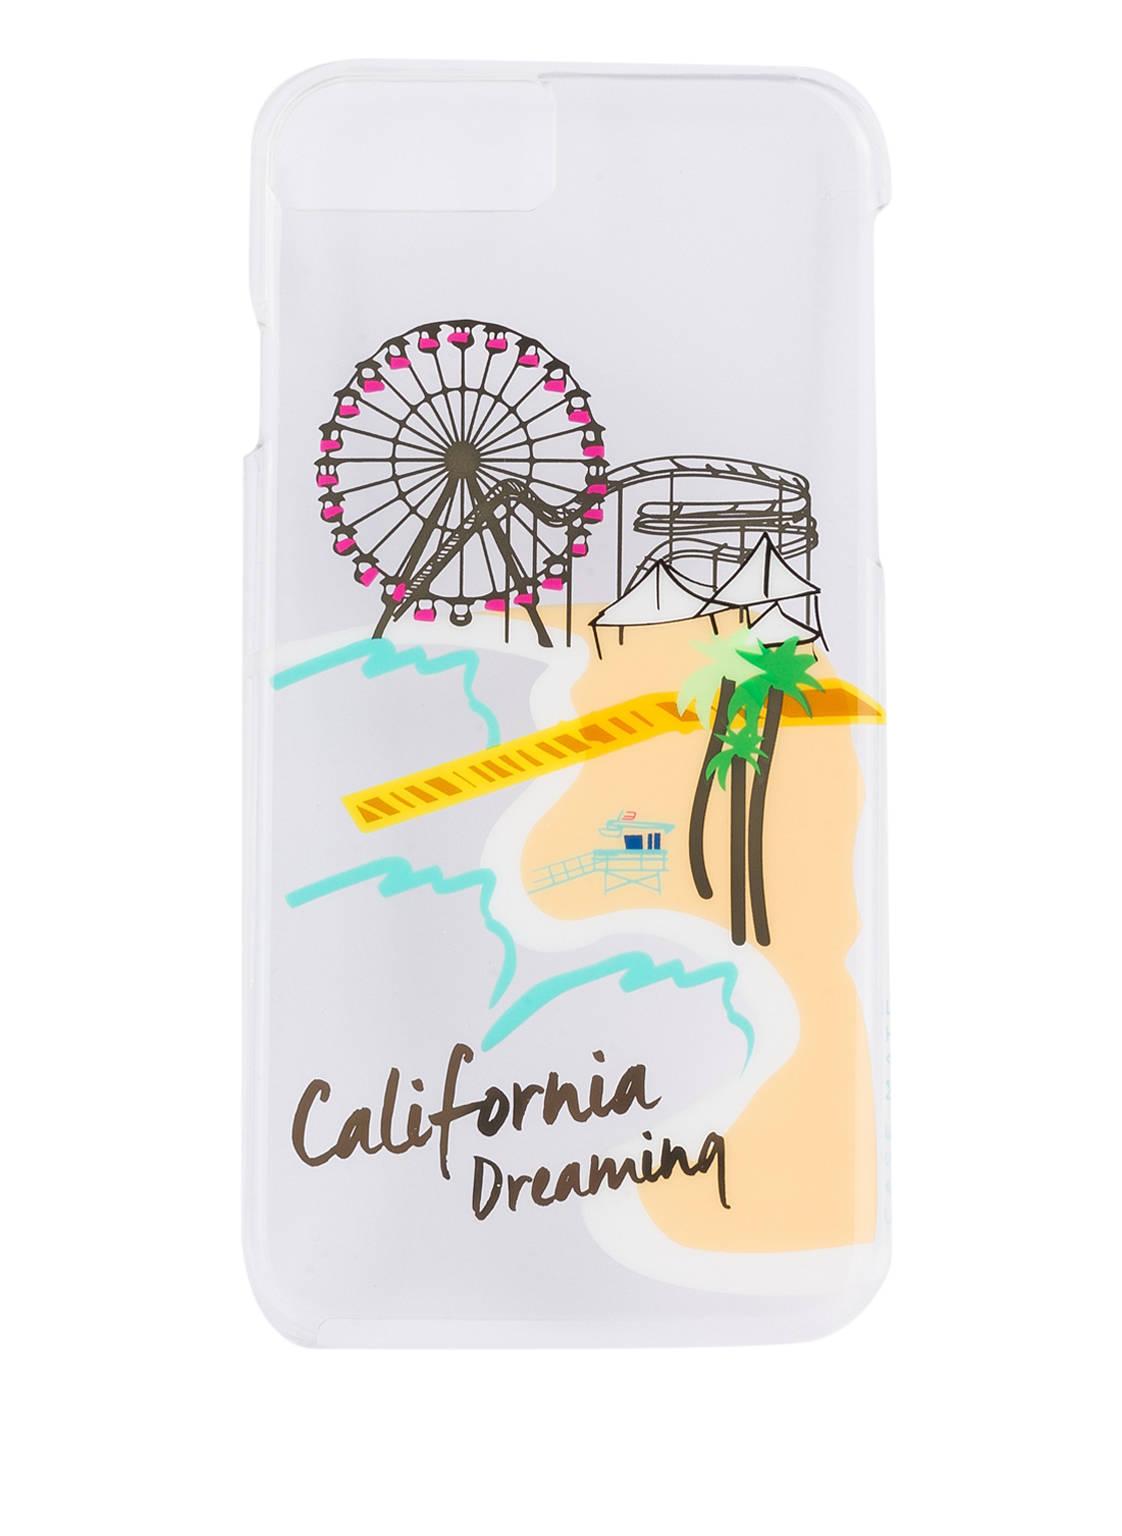 CASE-MATE iPhone-Hülle CALIFORNIA DREAMING